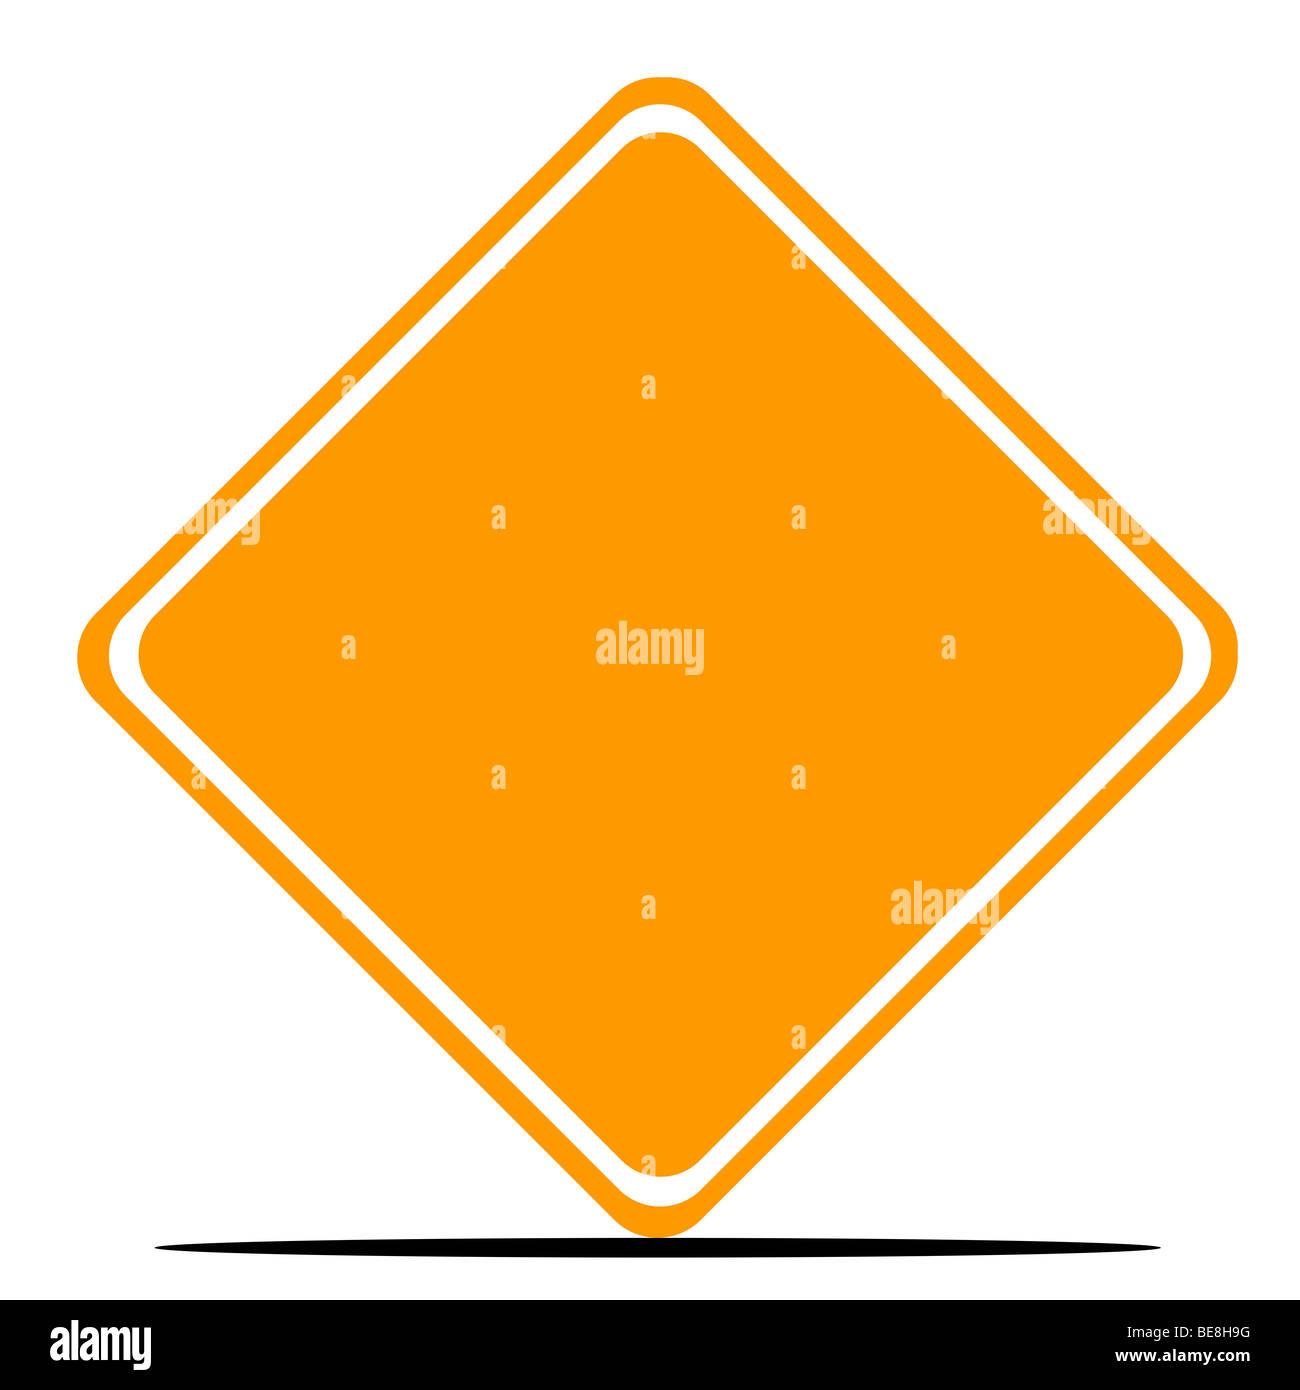 Blank orange diamond road sign isolated on white background stock blank orange diamond road sign isolated on white background buycottarizona Gallery